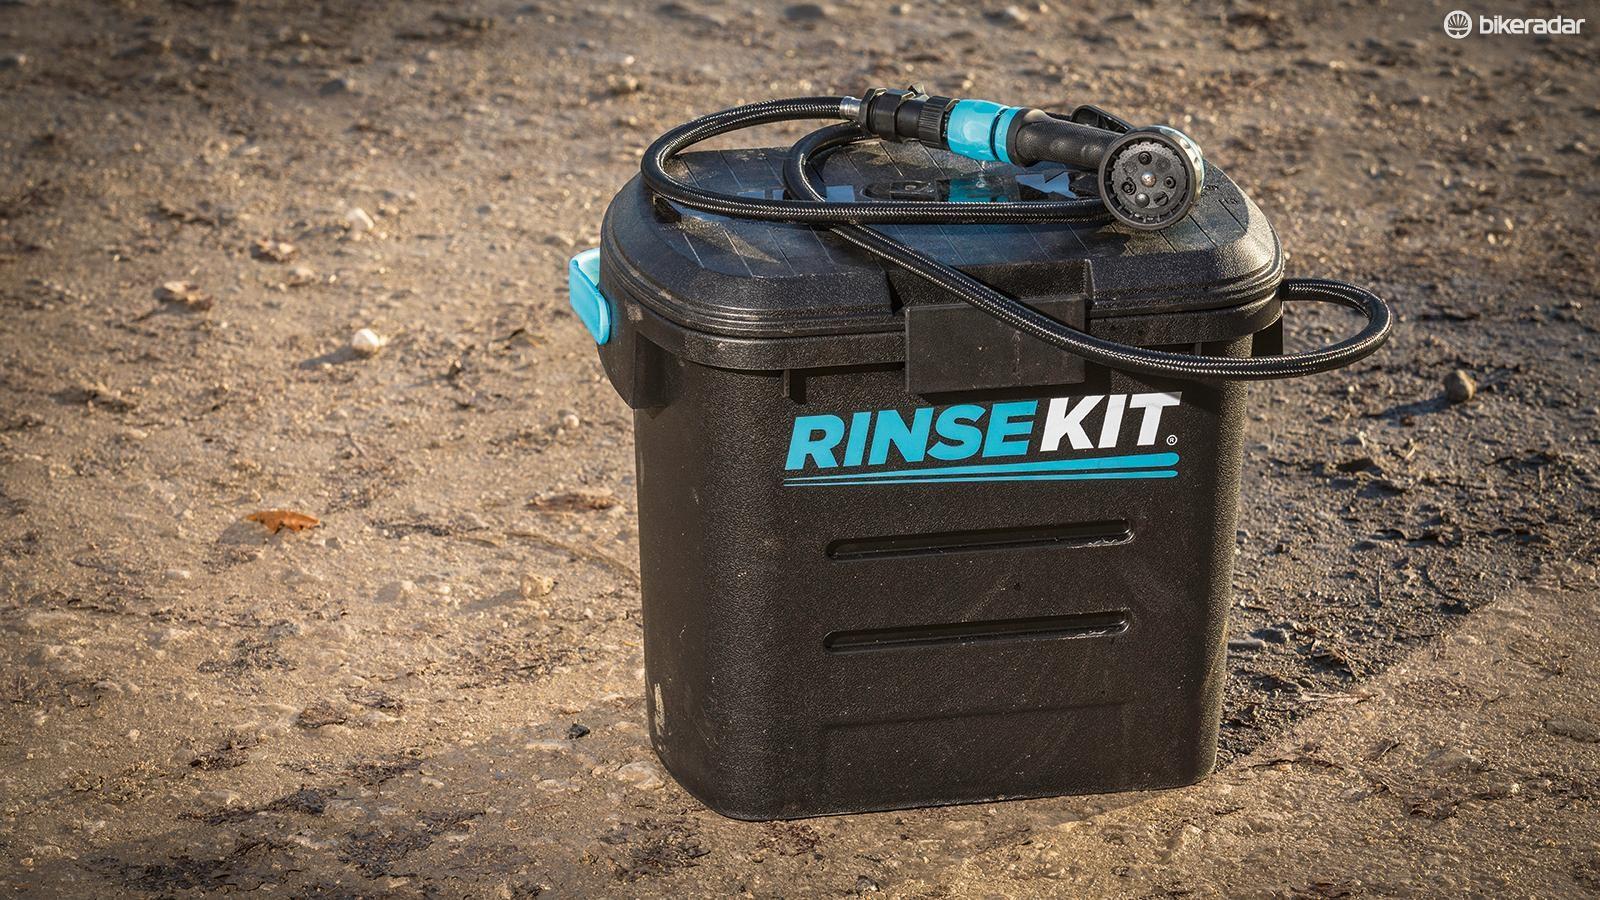 RinseKit battery/pump-free washer